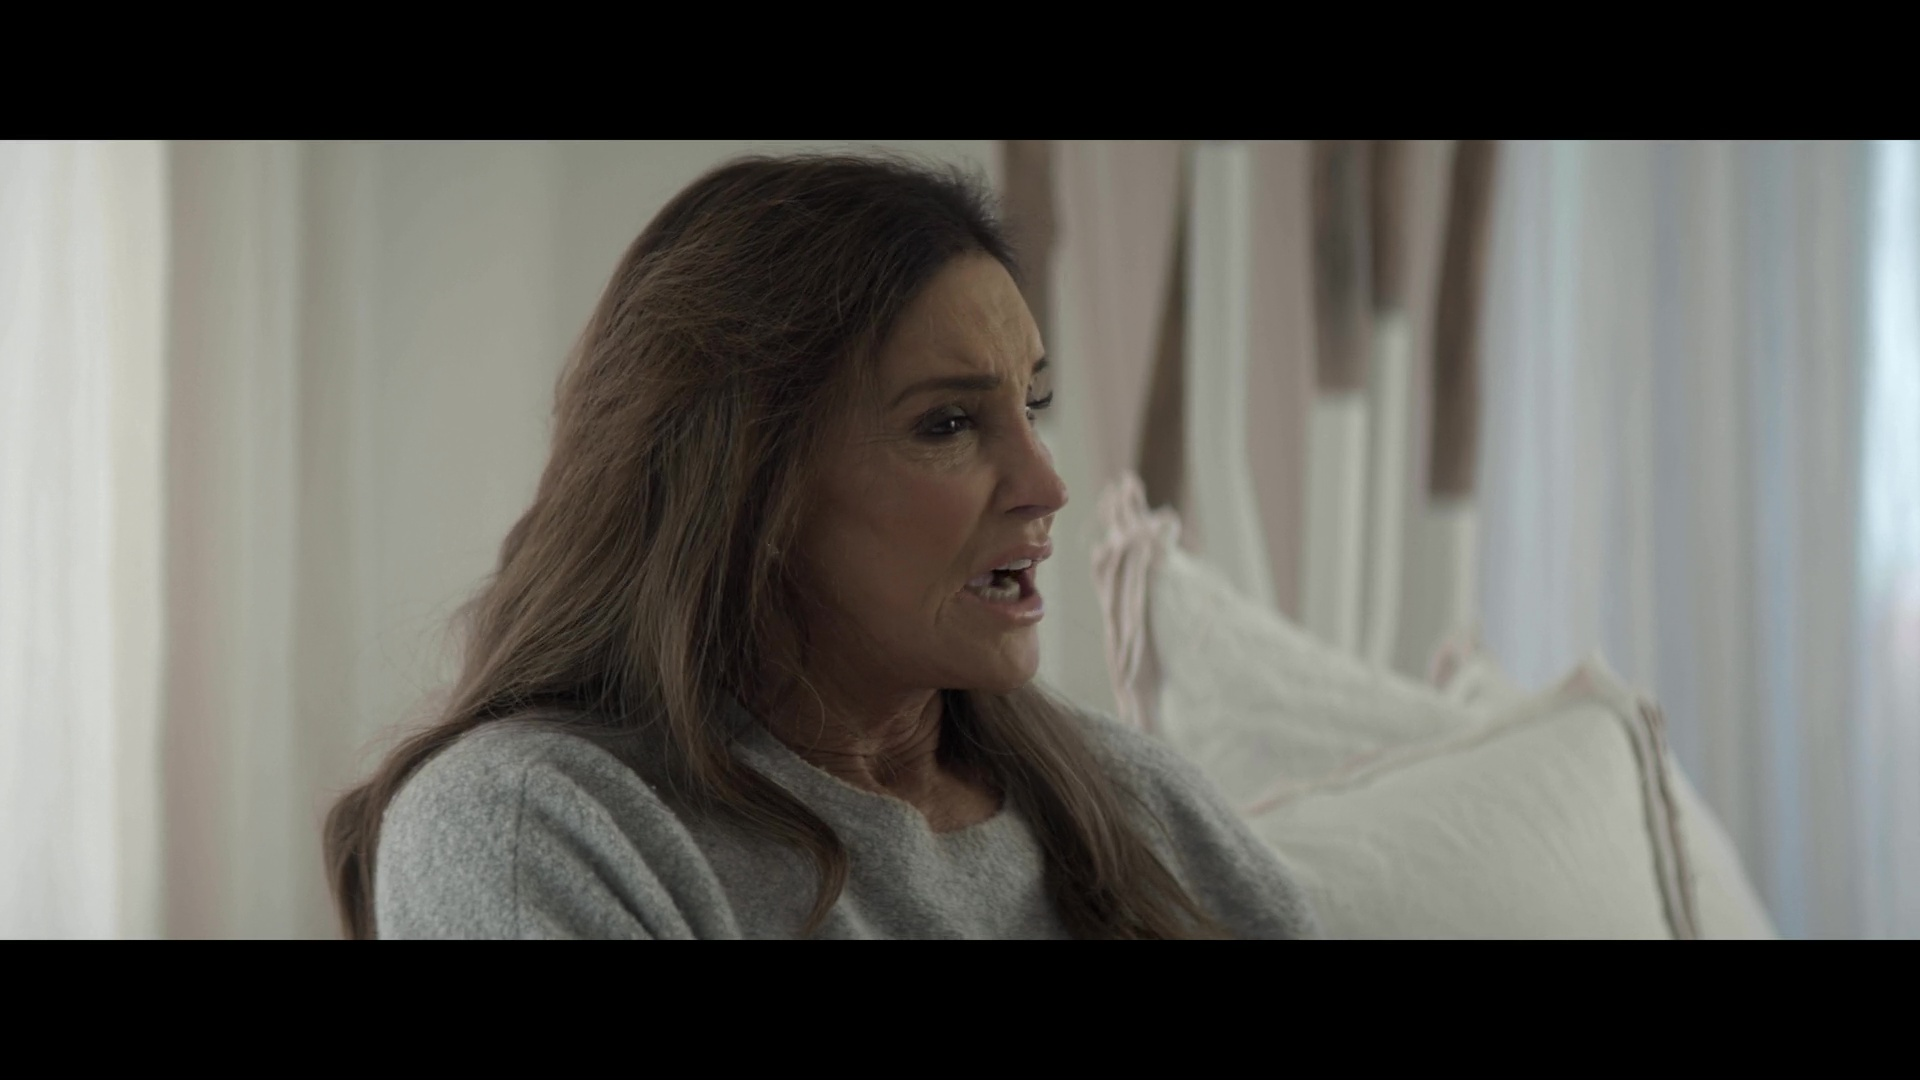 Al descubierto: Caitlyn Jenner (2021) 1080p WEB-DL Latino